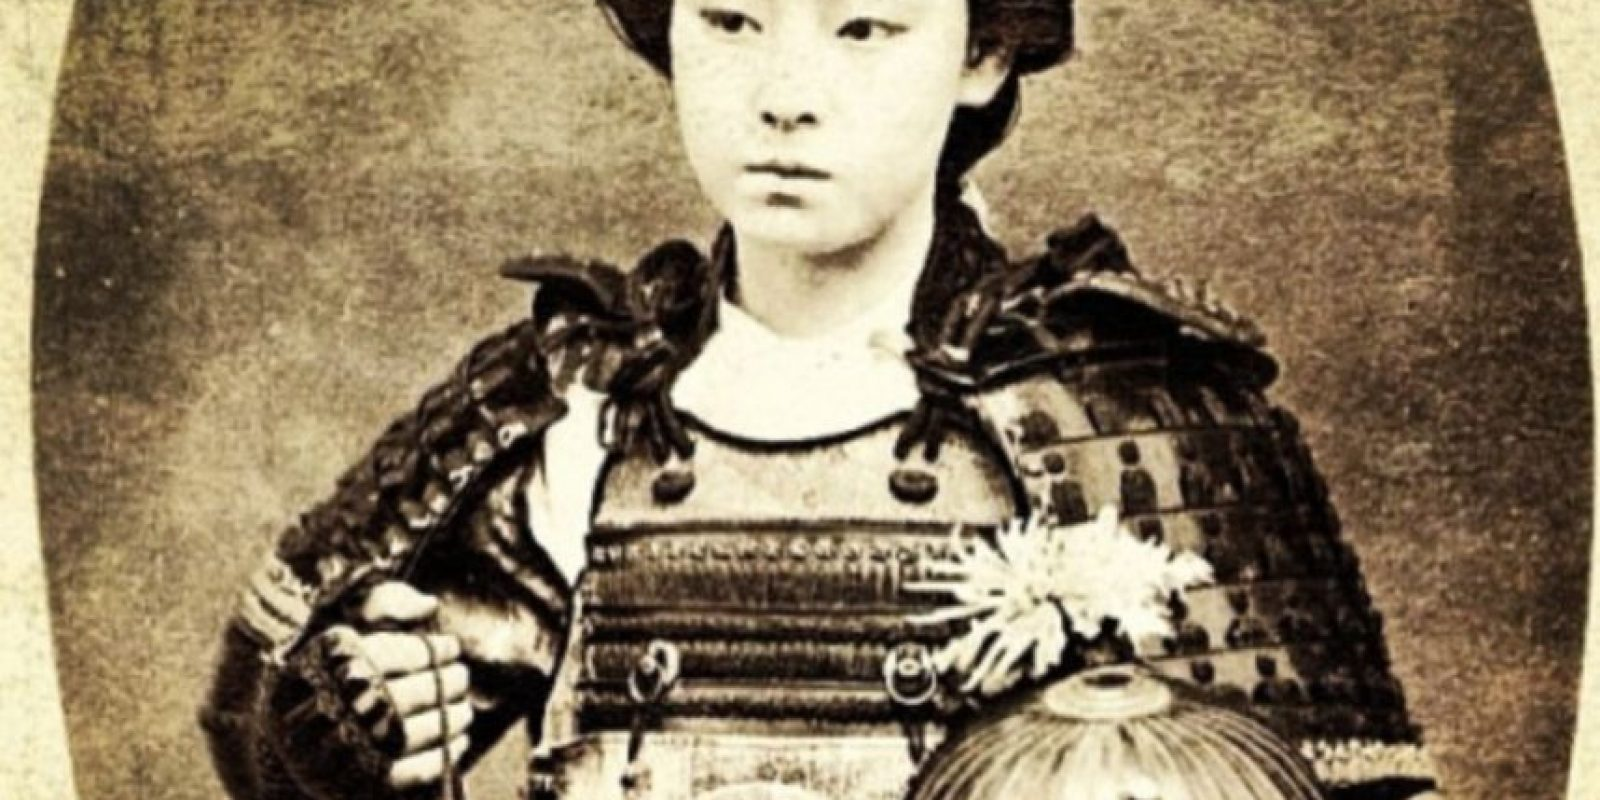 Esta foto pertenece a un actor del teatro kabuki del siglo pasado. Foto:The Museum of Hoax